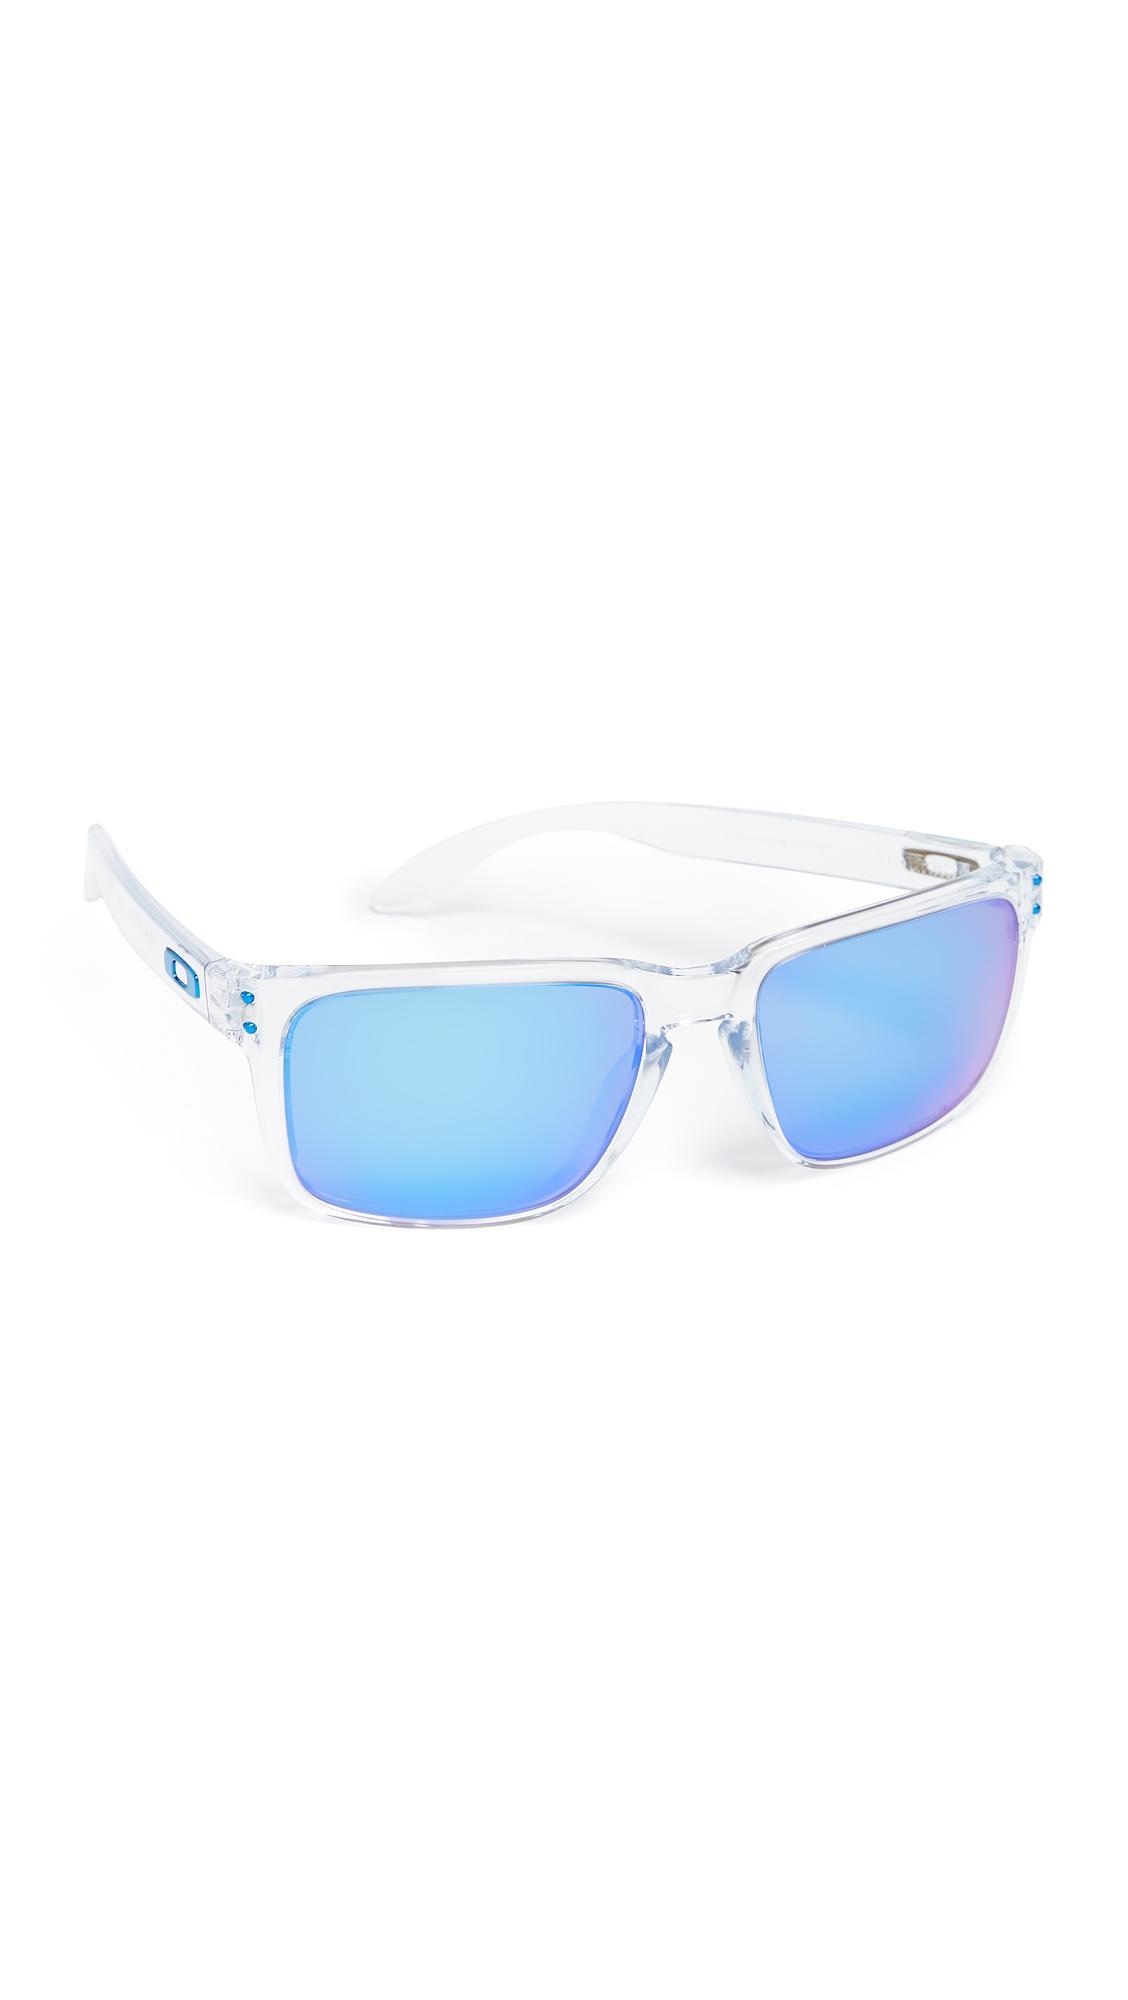 ba734d87bda9 Oakley Holbrook Xl Polarized Sunglasses In Polished Clear/Prism Sapphire